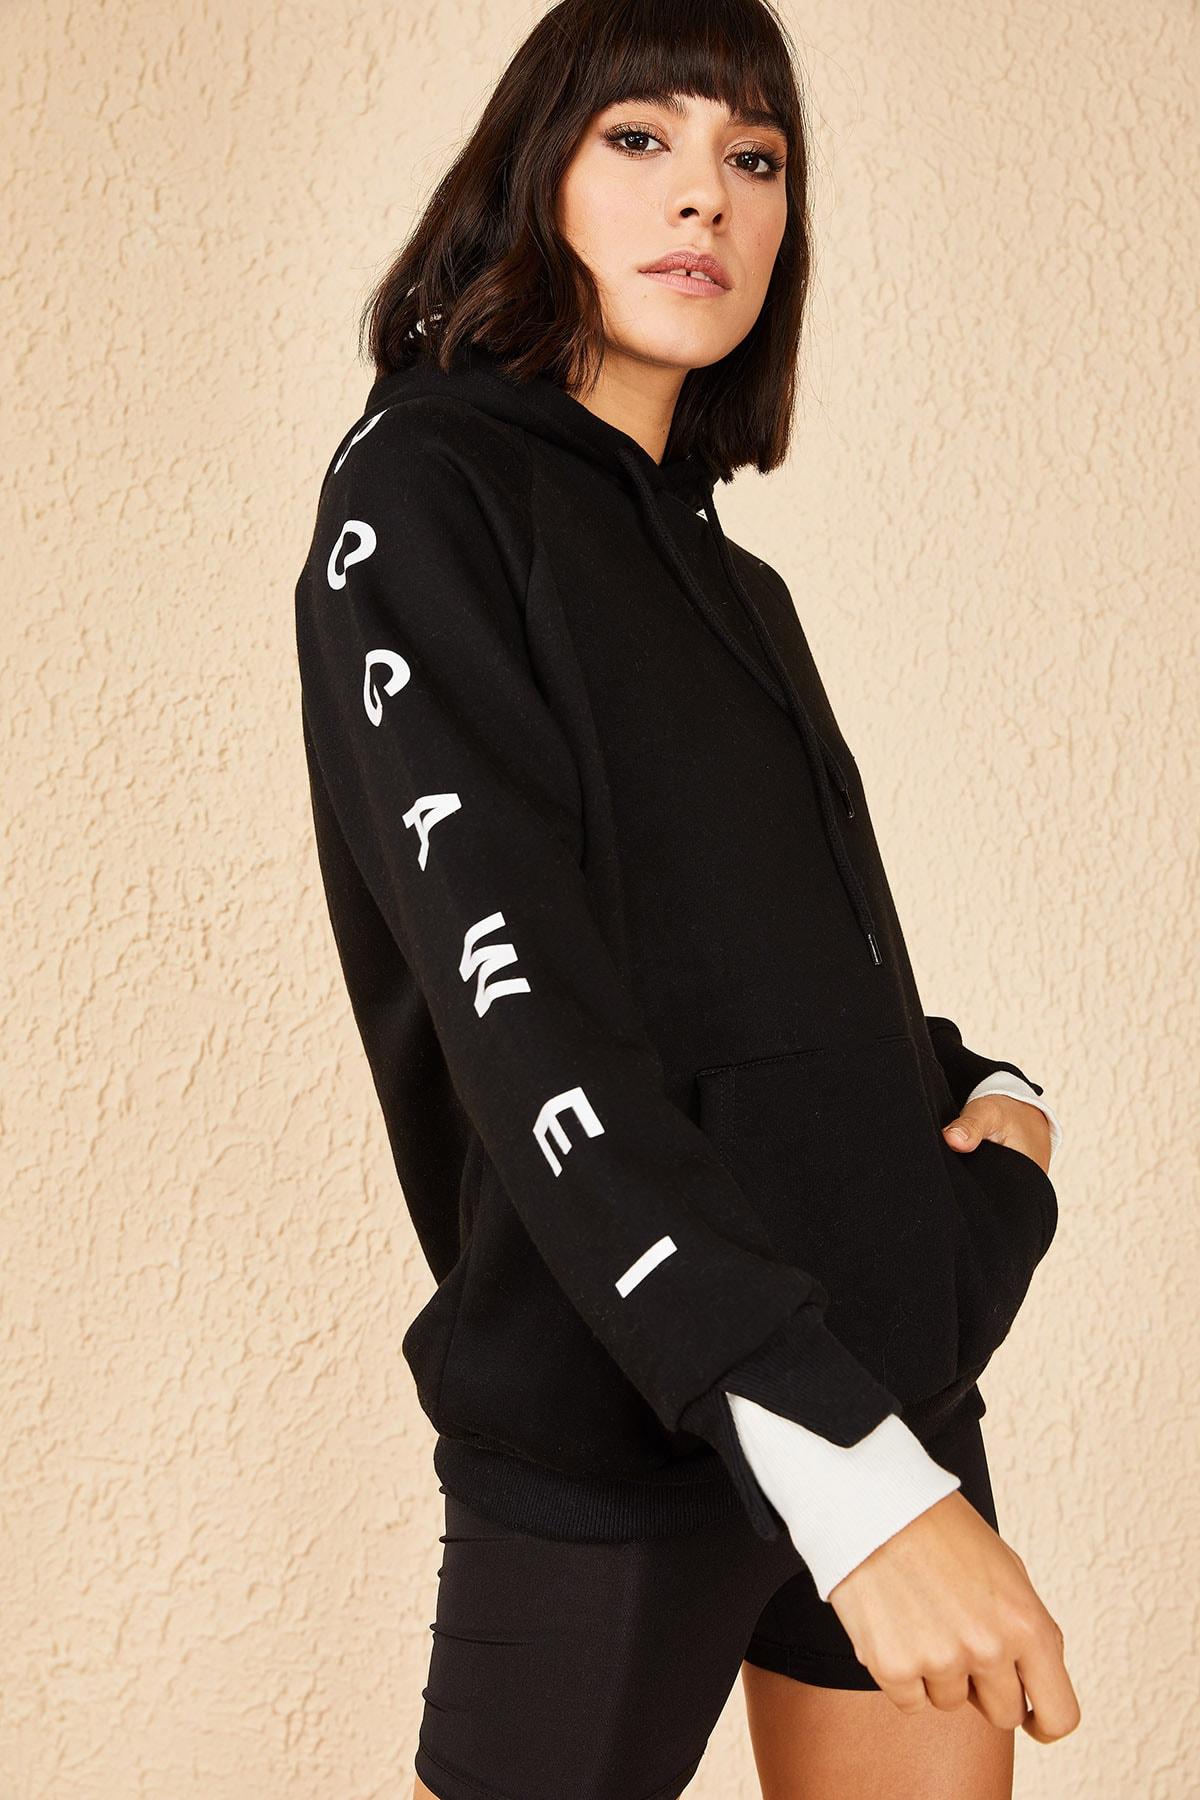 Bianco Lucci Kadın Siyah İkili Manşet İçi Pamuklu 3 İplk Sweatshirt 10171012